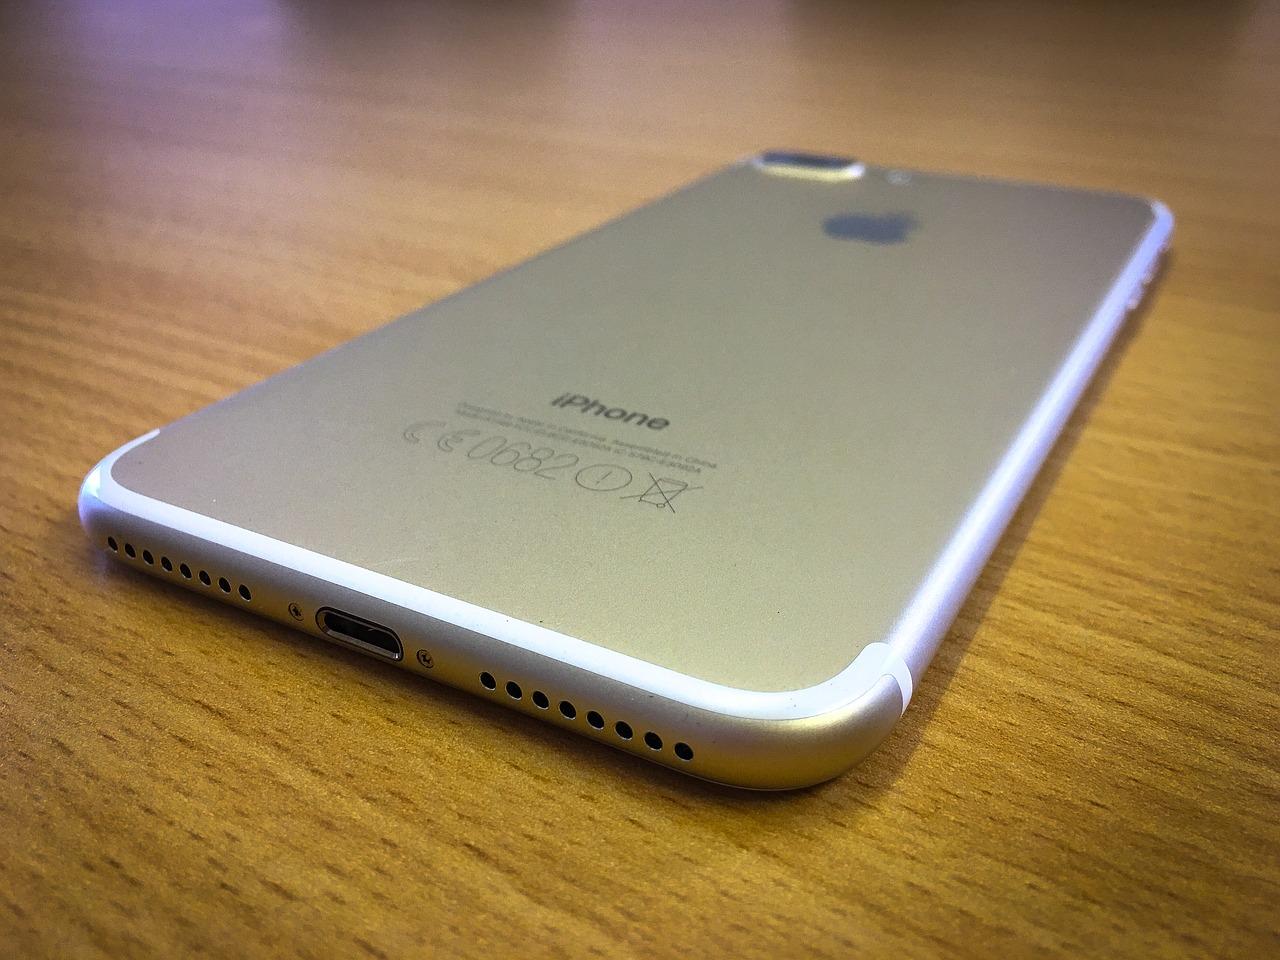 iphone-1680361_1280.jpg